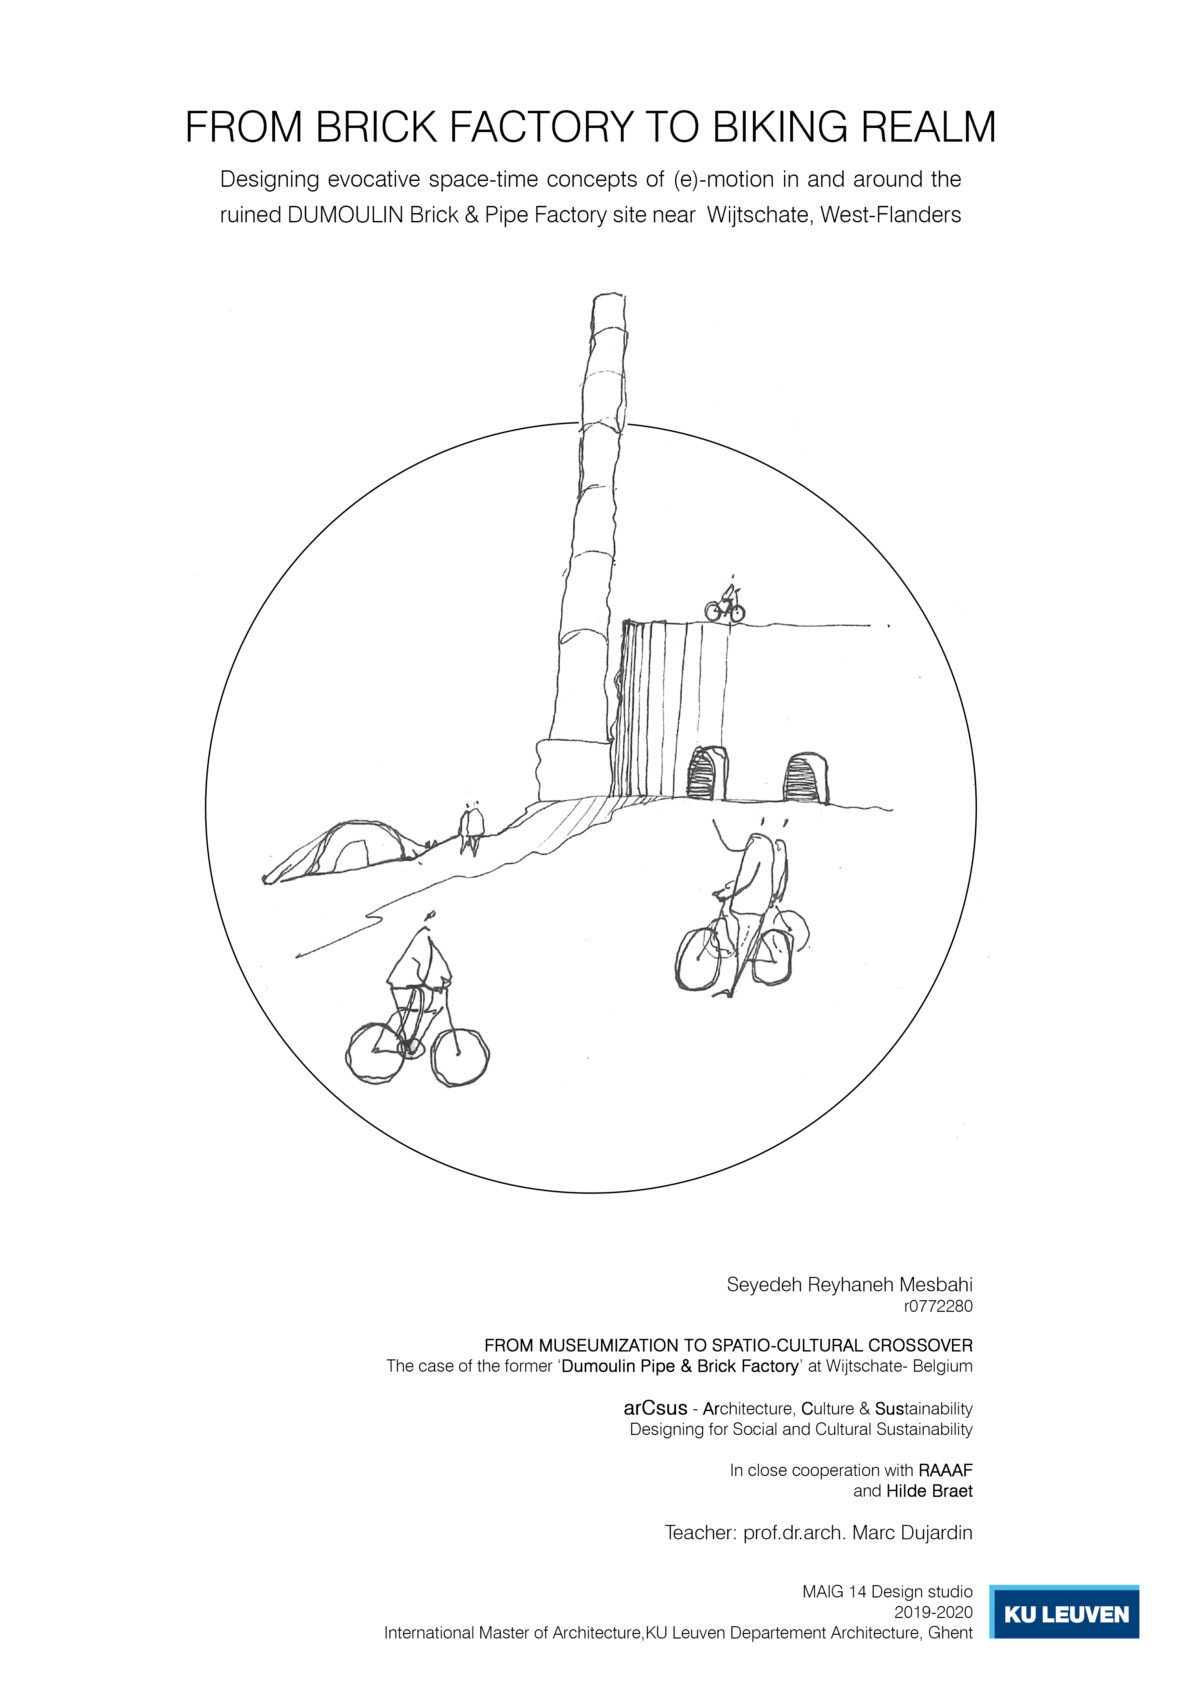 from-brick-factory-to-biking-rhi-leporello-maig14-2019-2020-1